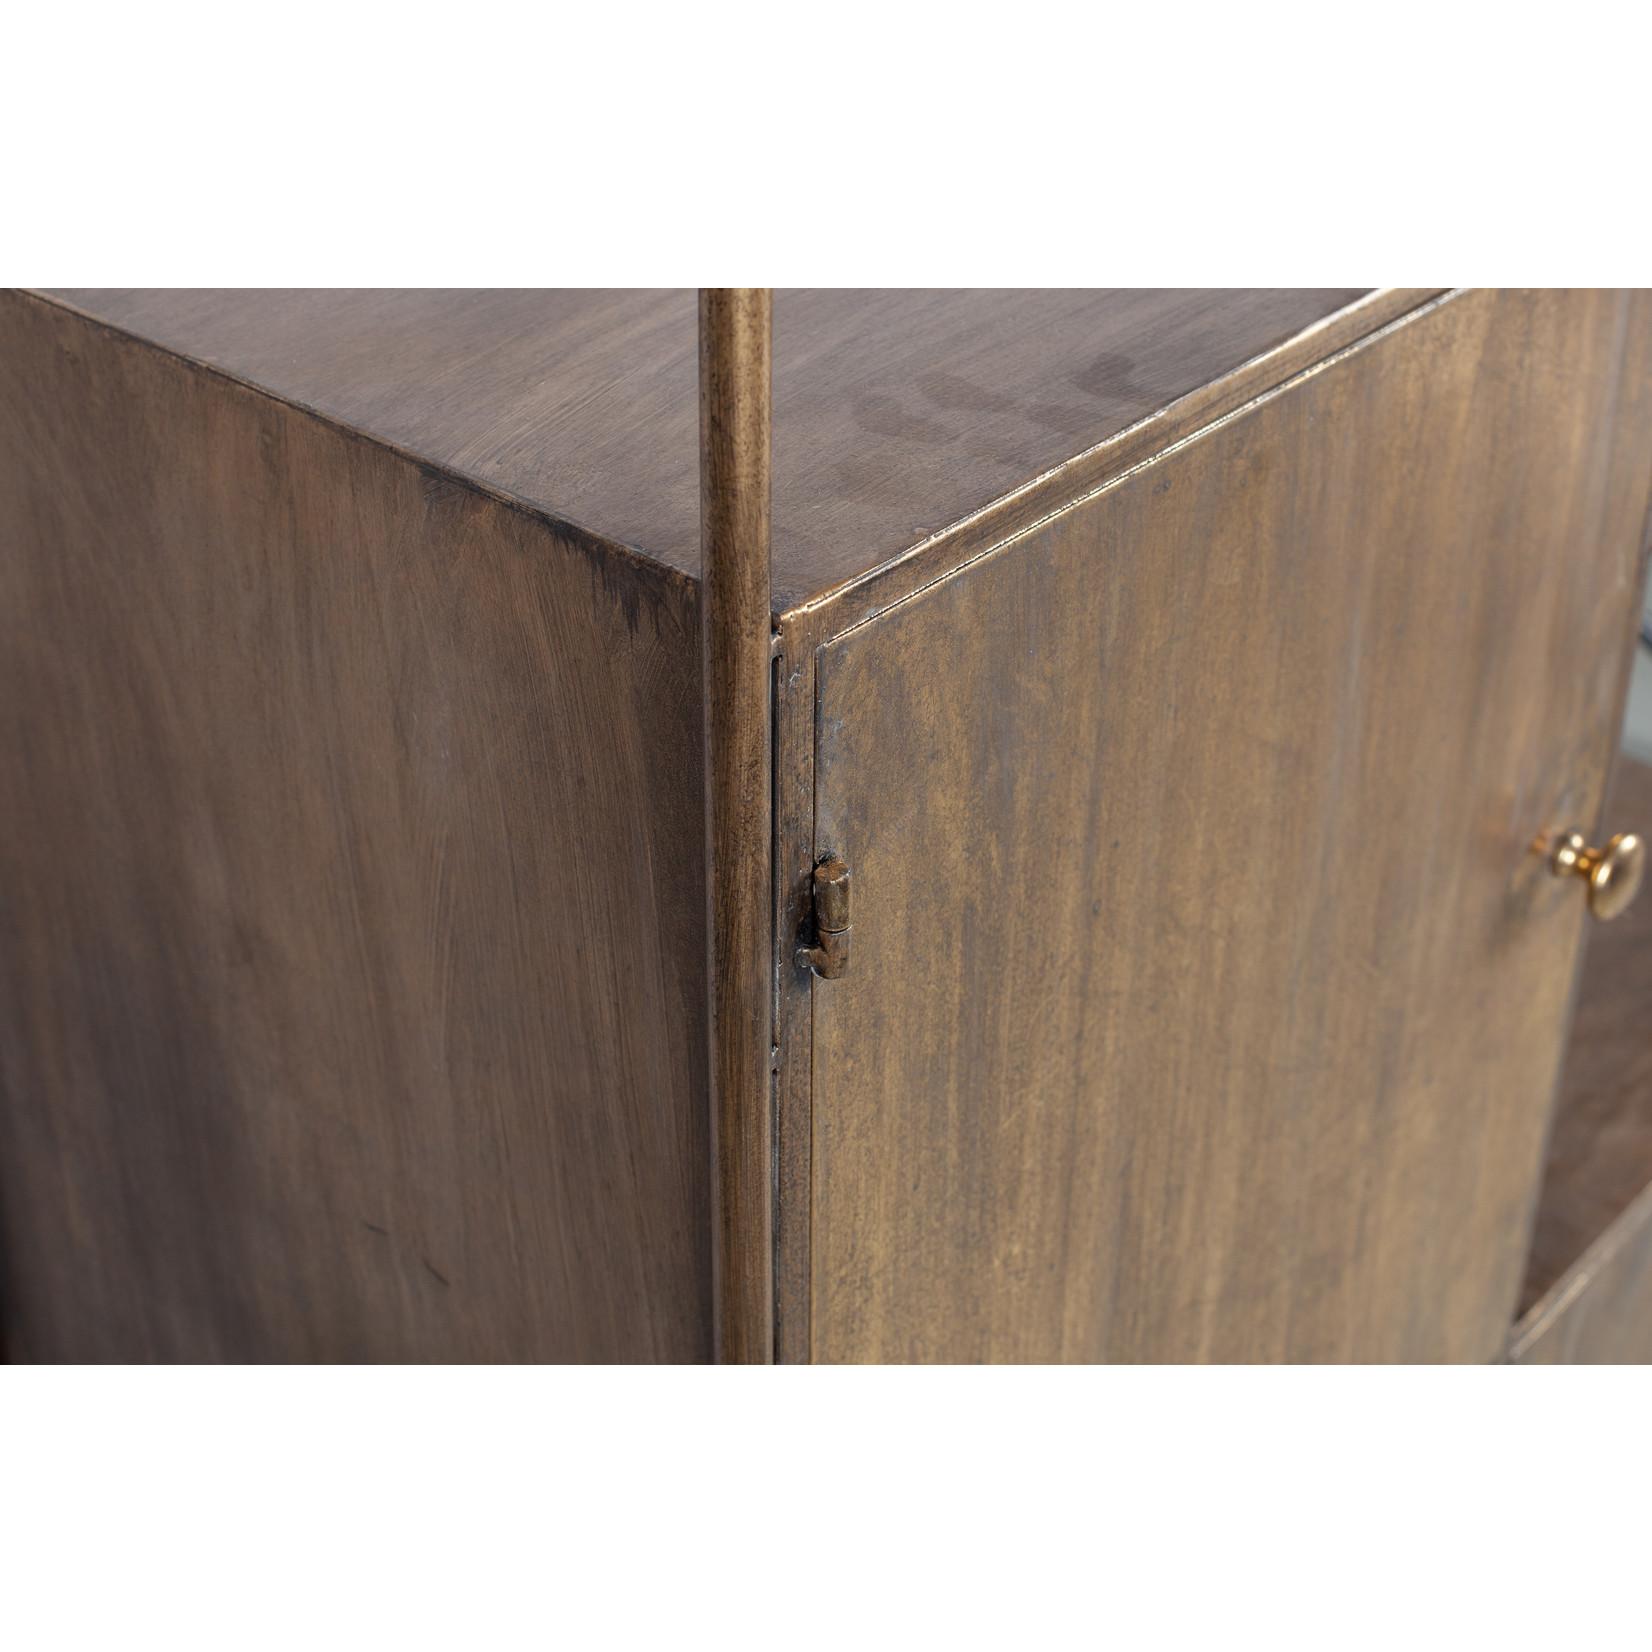 Be Pure Home Chief Vakkenkast Metaal Antique Brass